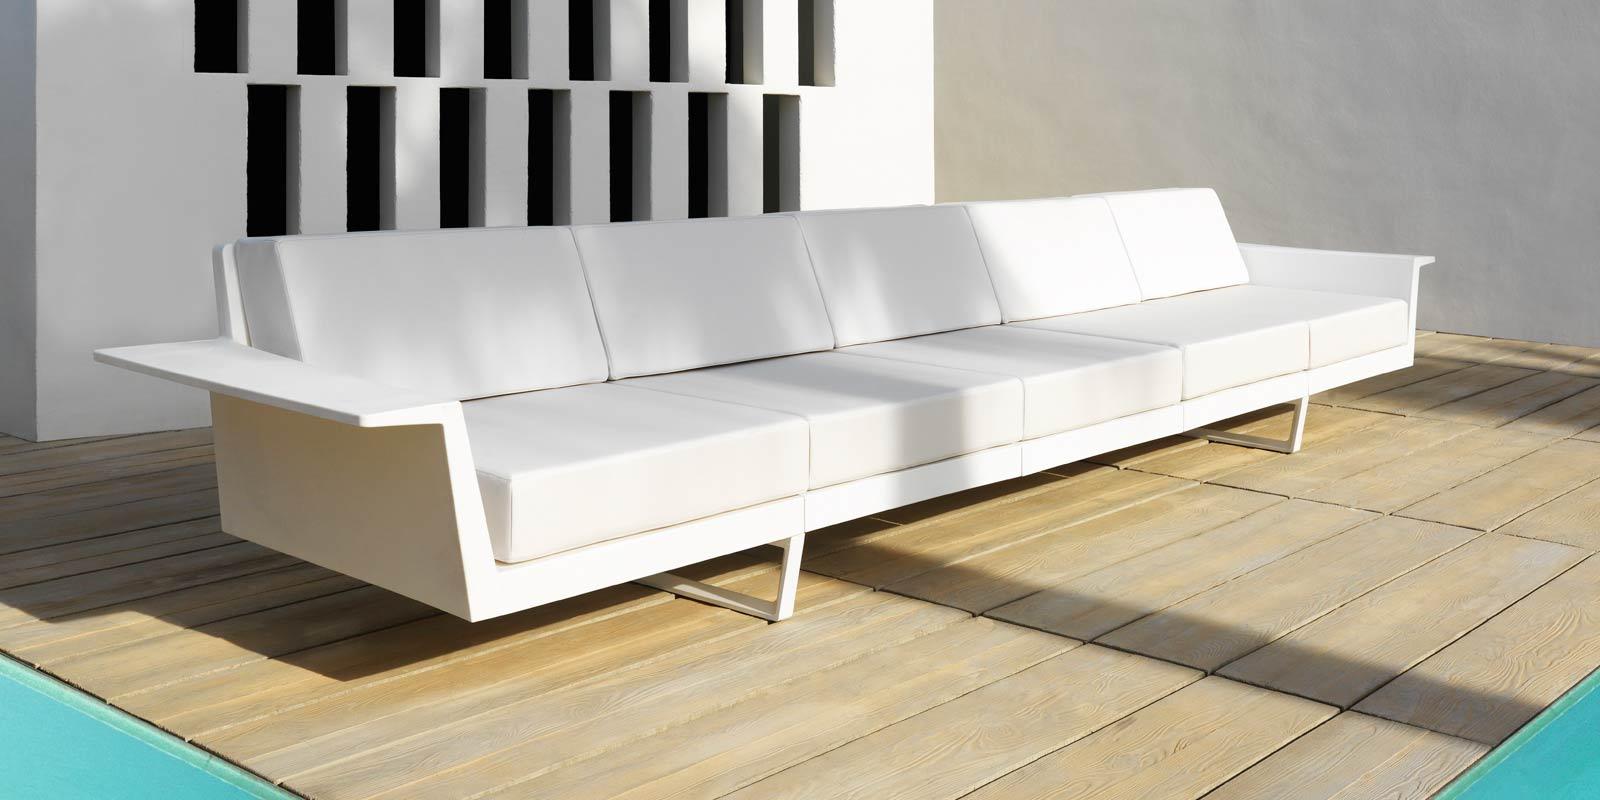 Delta a lounge outdoor 5 seat sofa by vondom shown here with matt finish